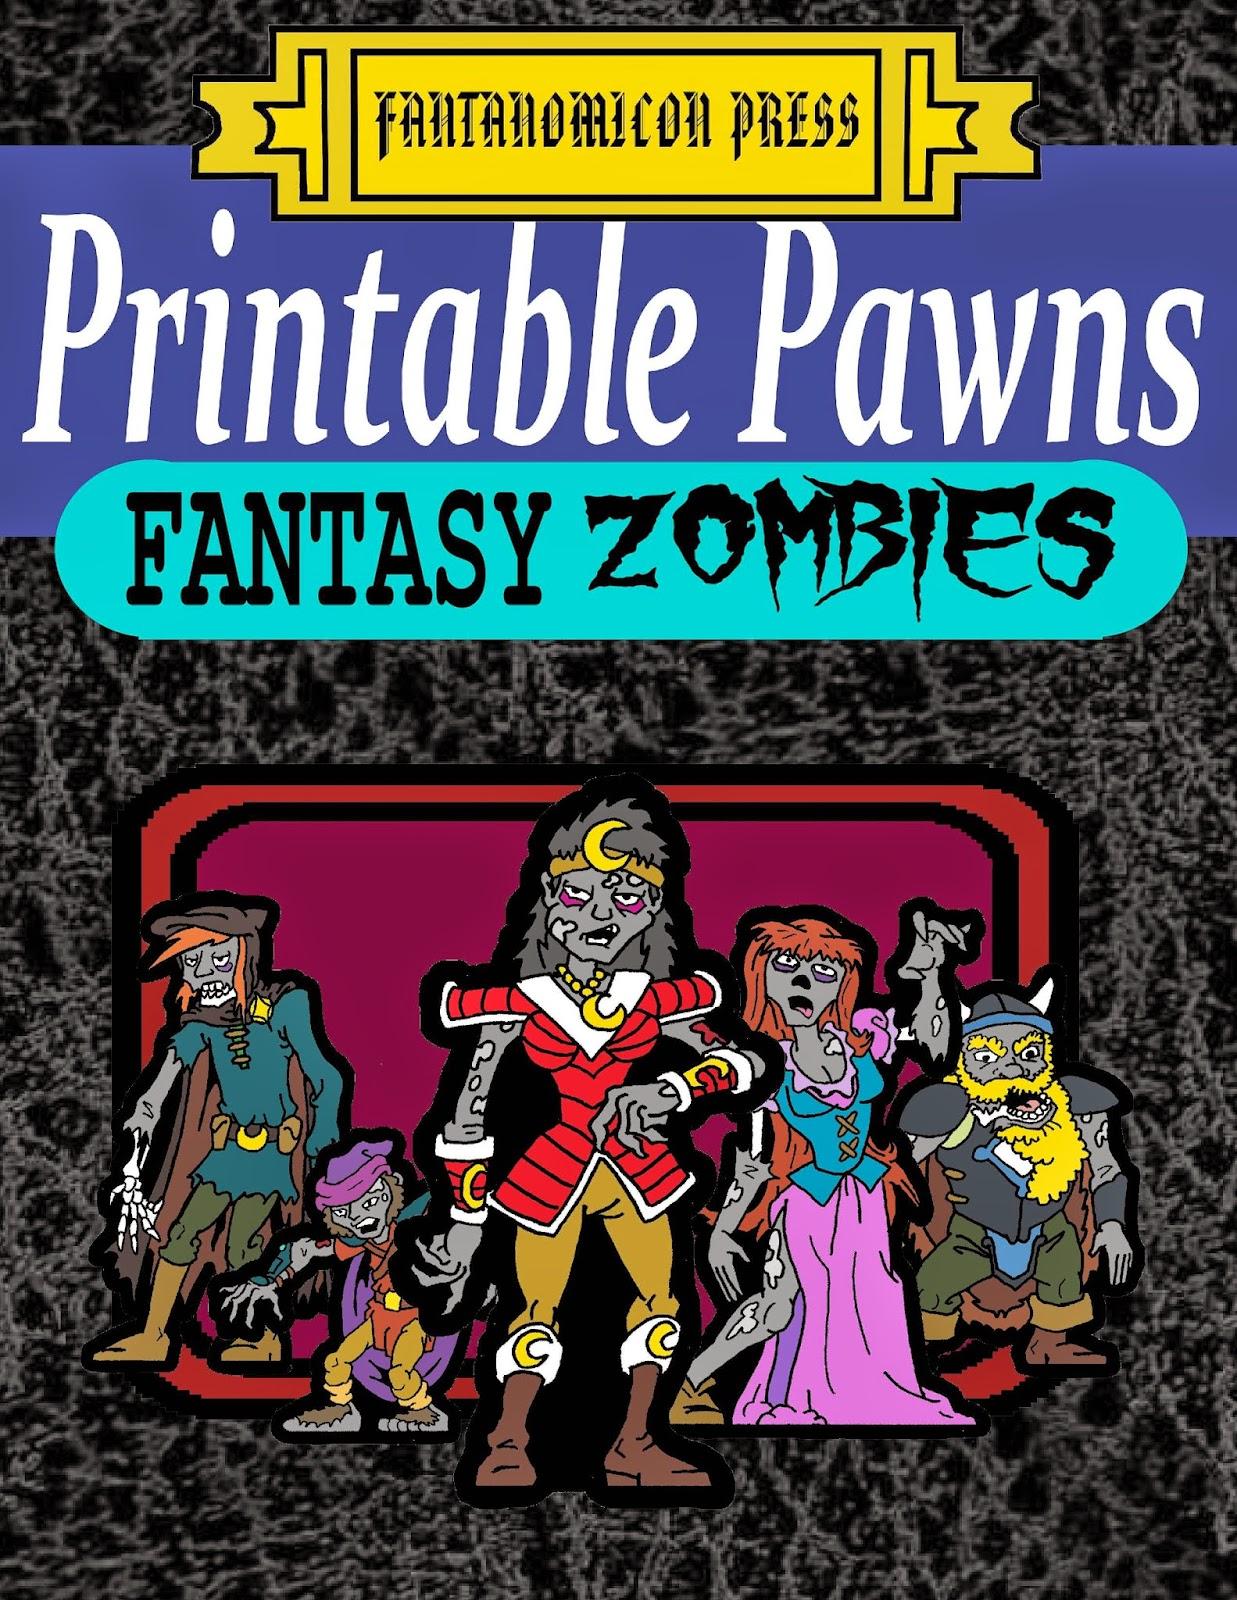 http://fantanomiconpress.blogspot.com/search/label/zombies